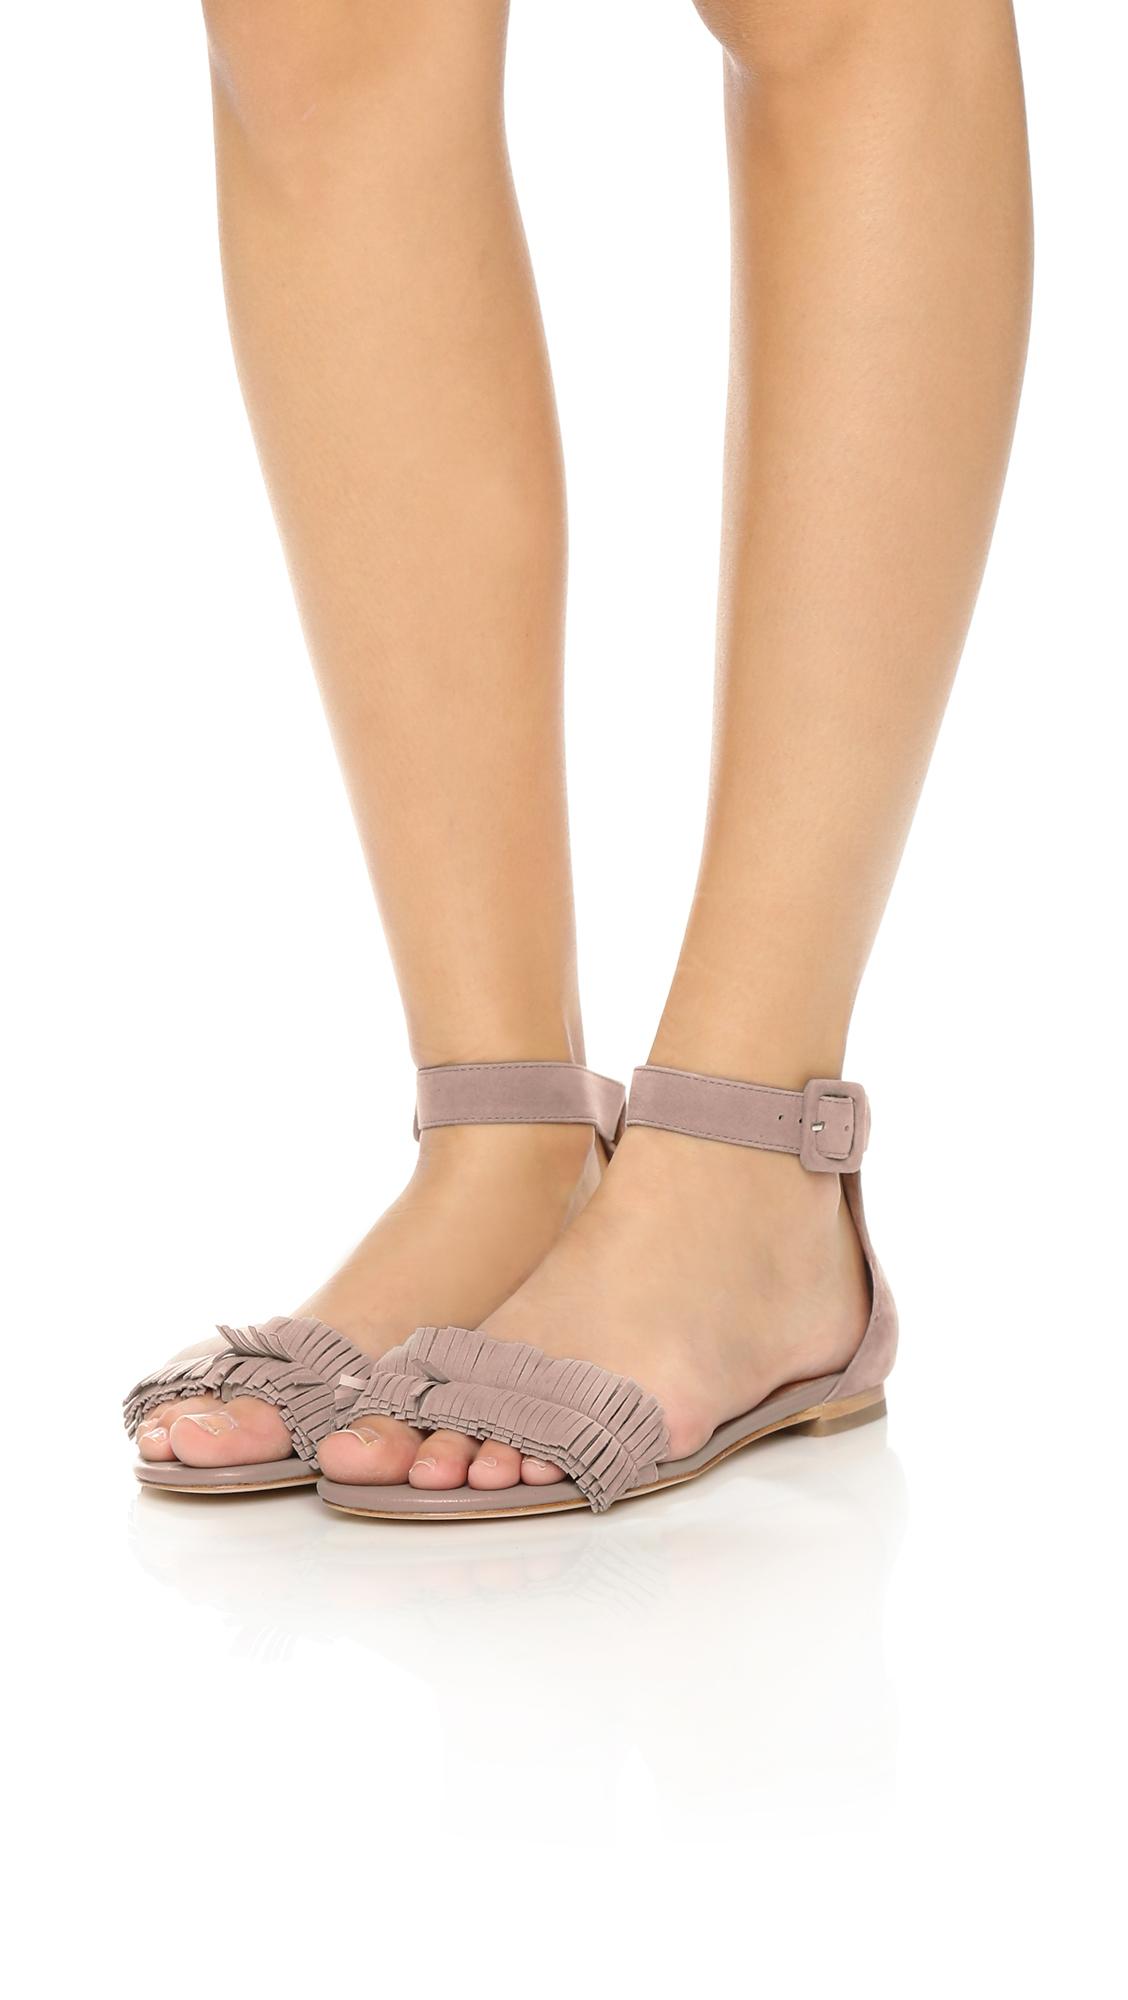 6bfb8defdd9a Lyst - Joie Ferris Suede Flat Sandals - Sandstone in Natural